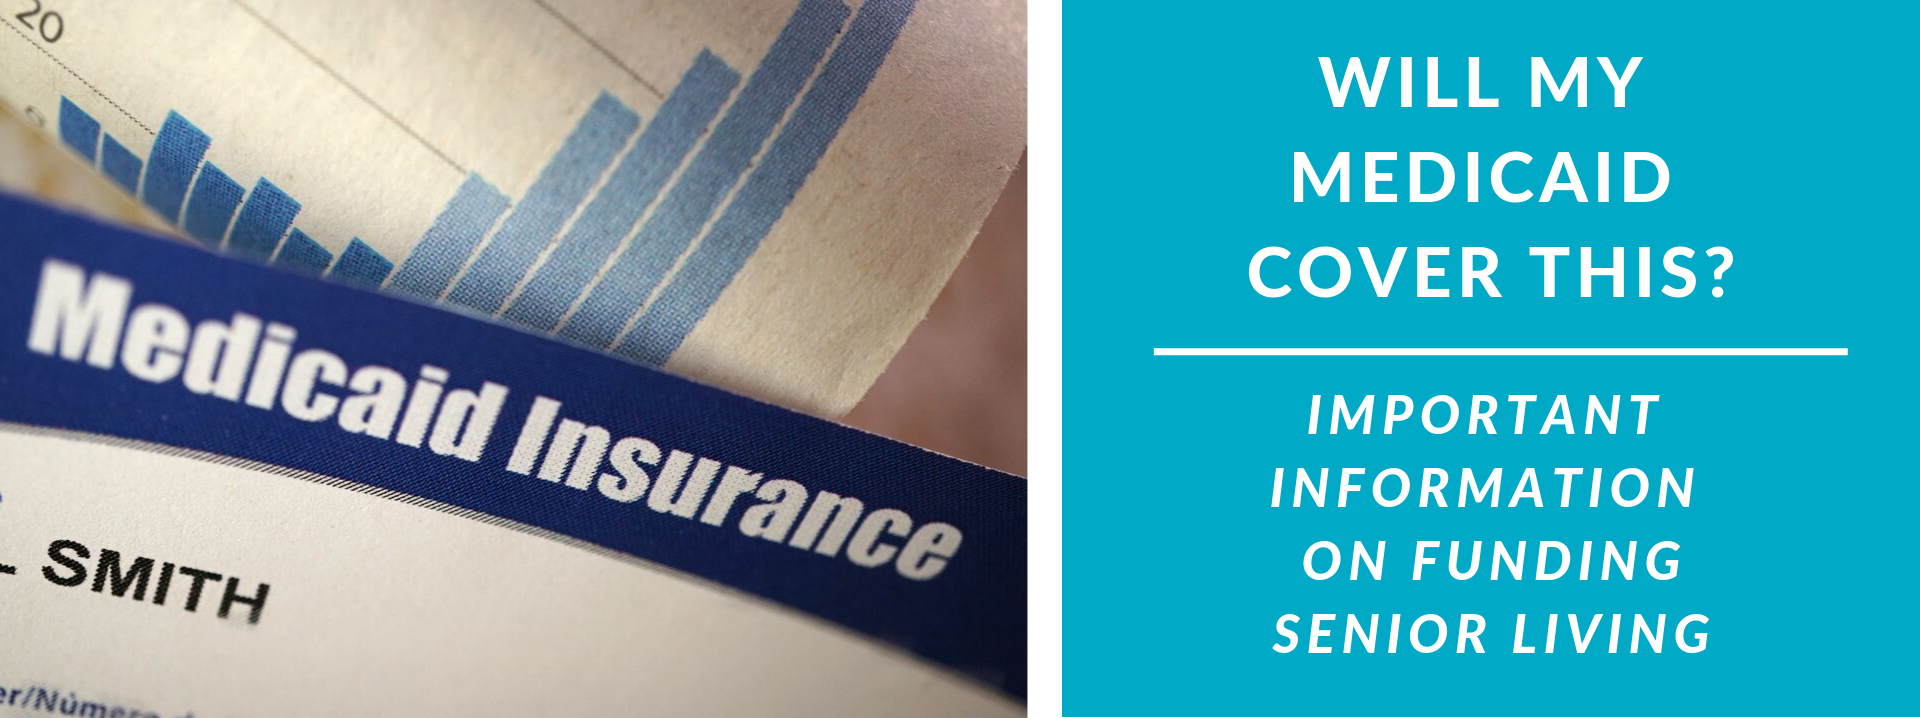 Medicaid Insurance: Will it Fund Senior Living?